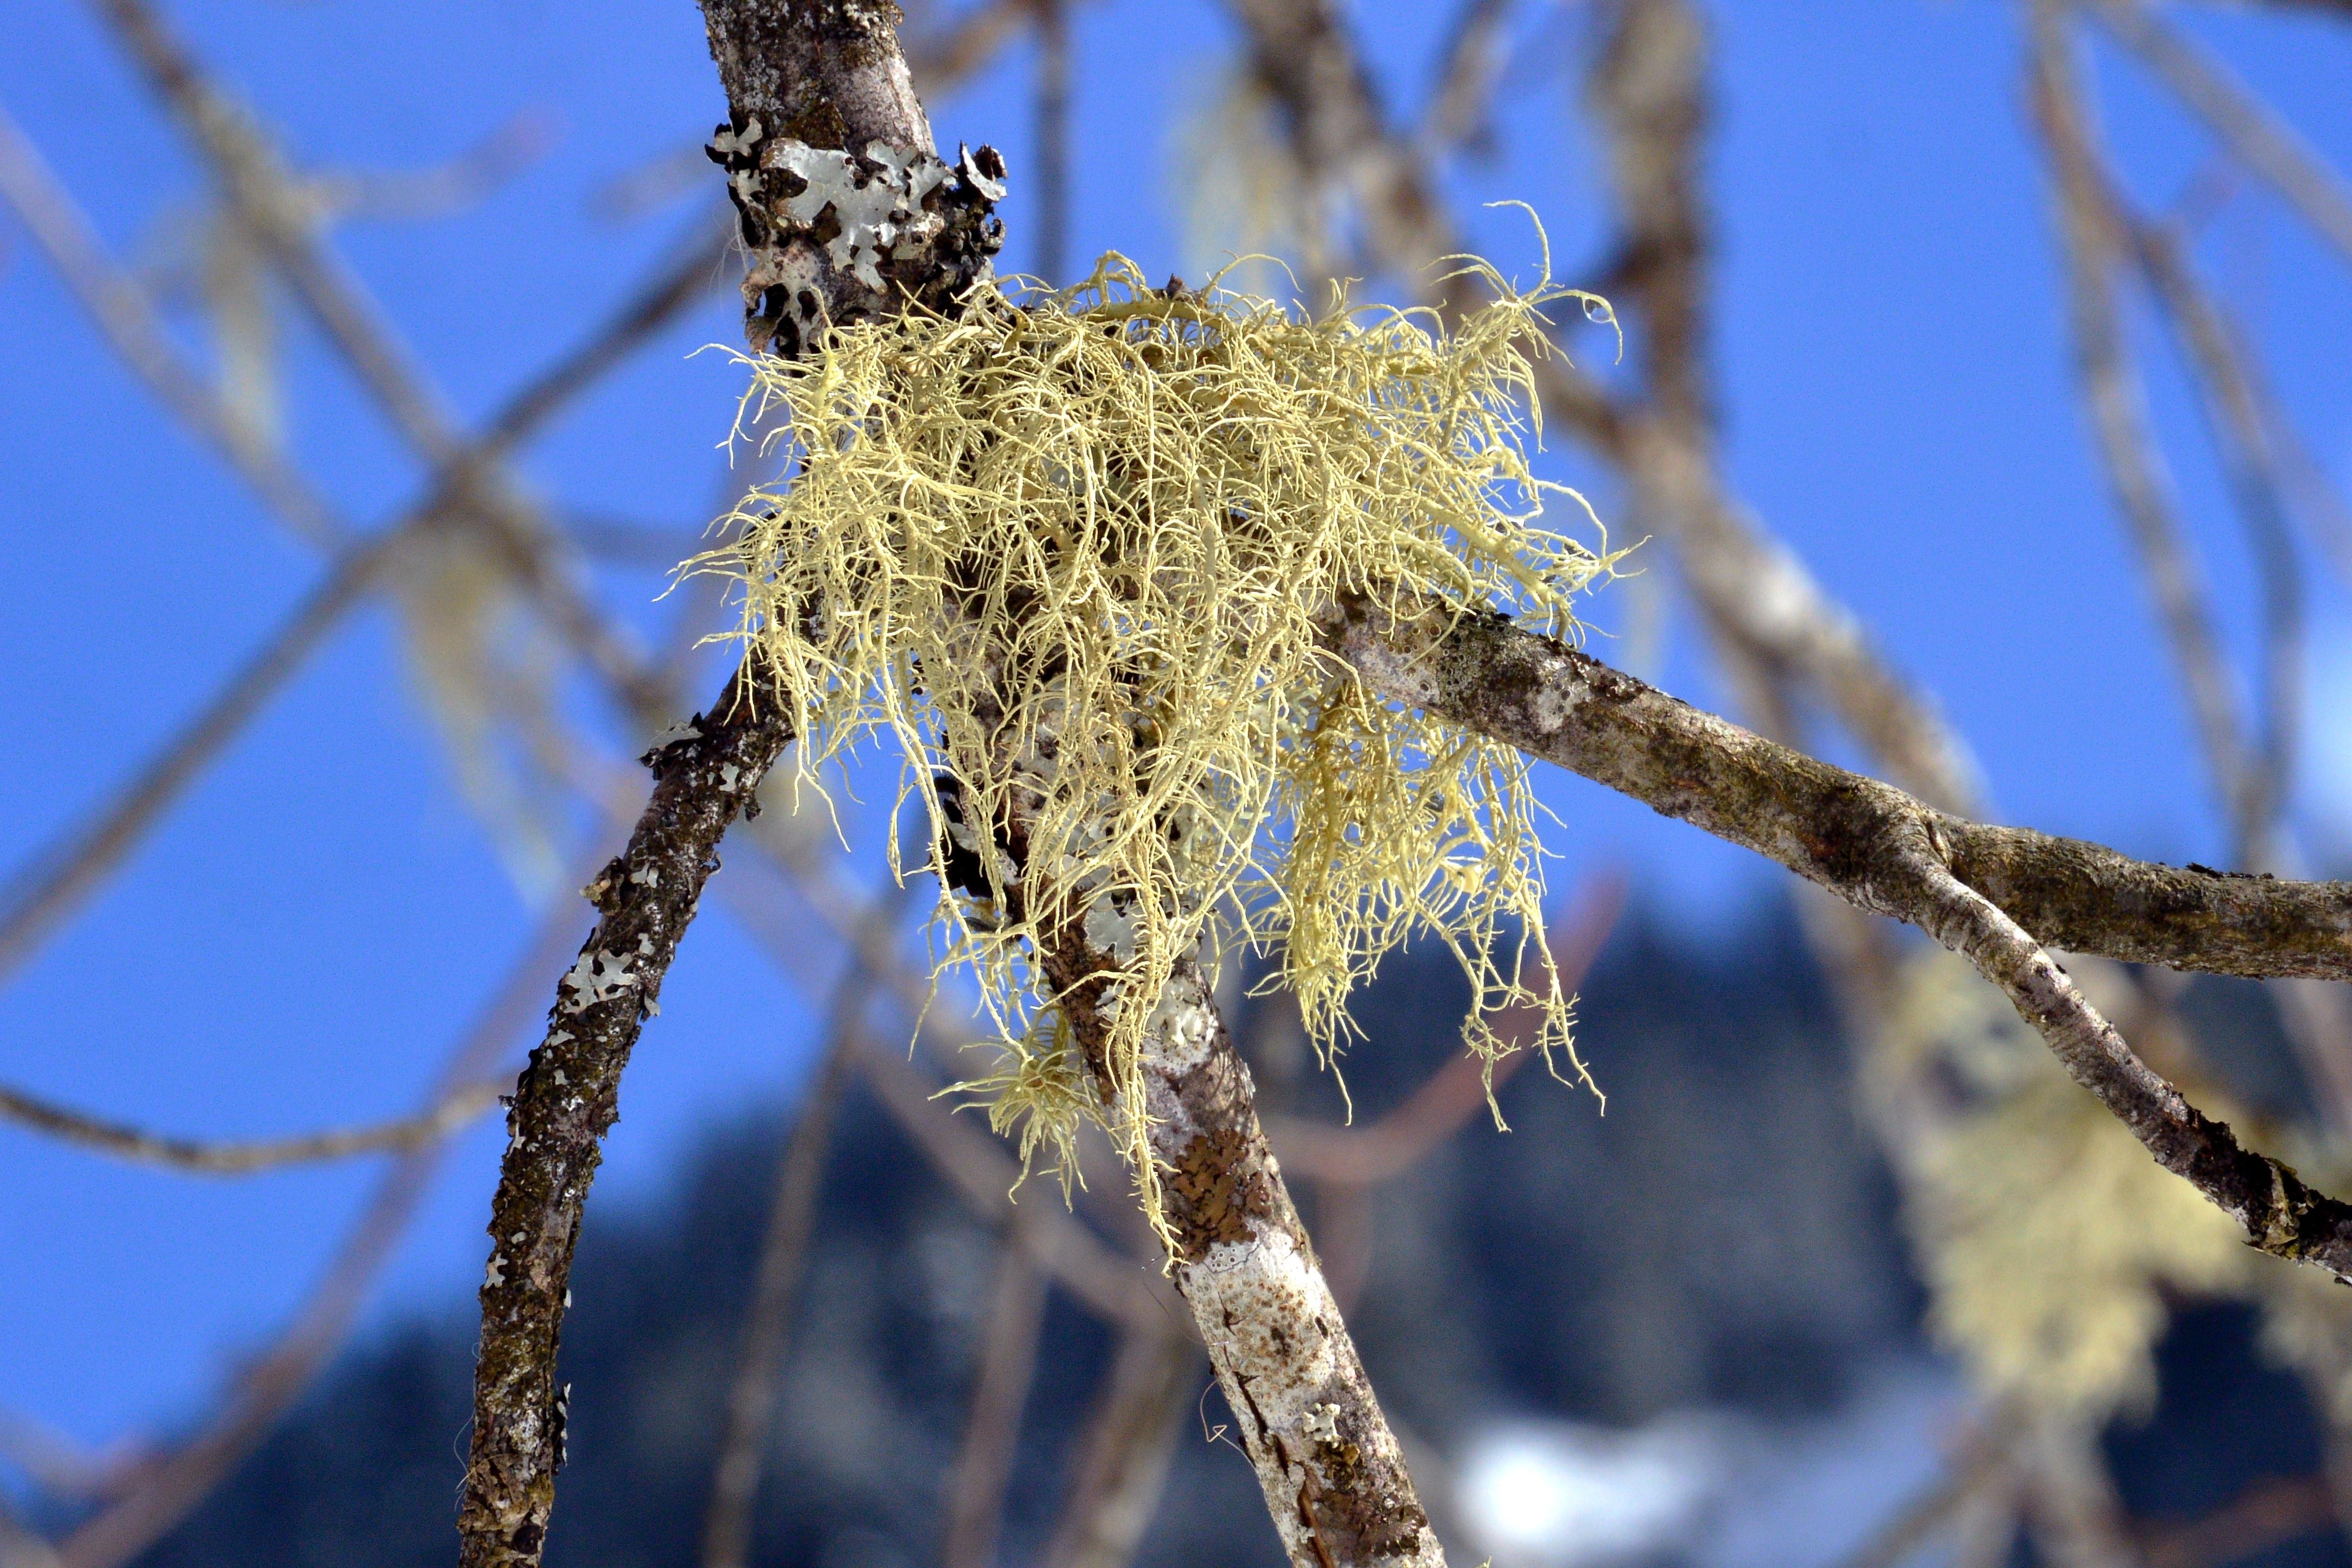 lichen-branch-bark-sky-tree-forest-wallpaper.jpg